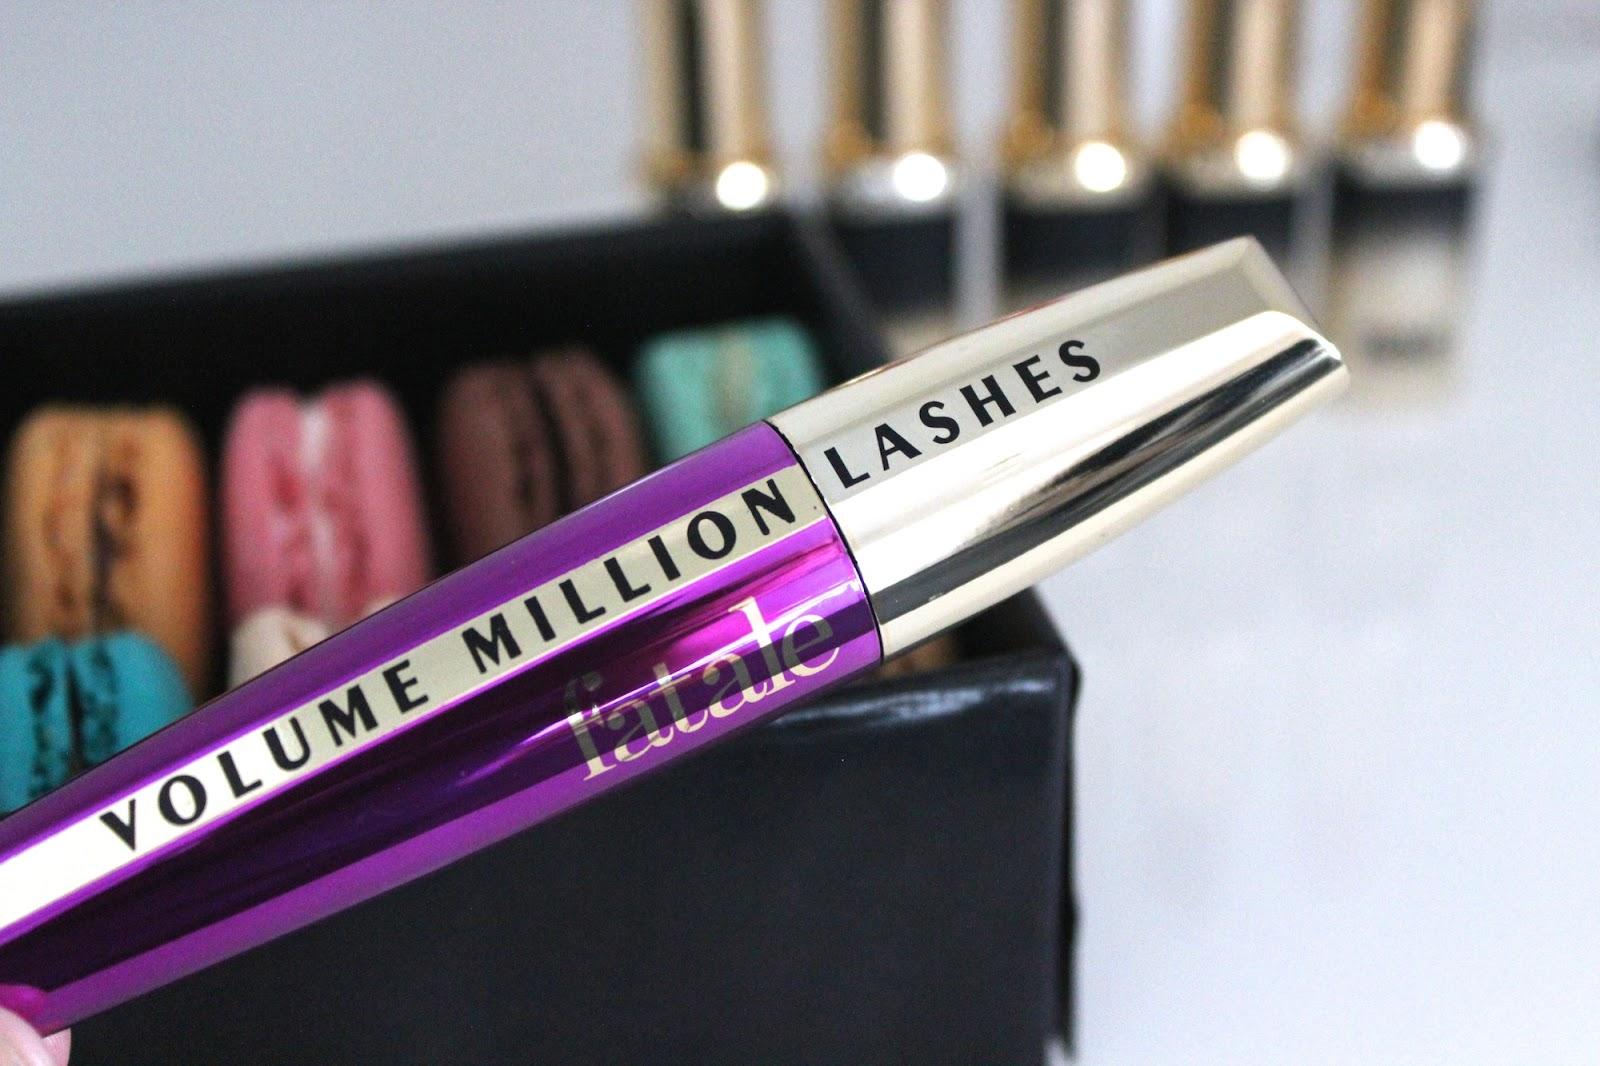 L'Oreal Paris Volume Million Lashes Fatale mascara